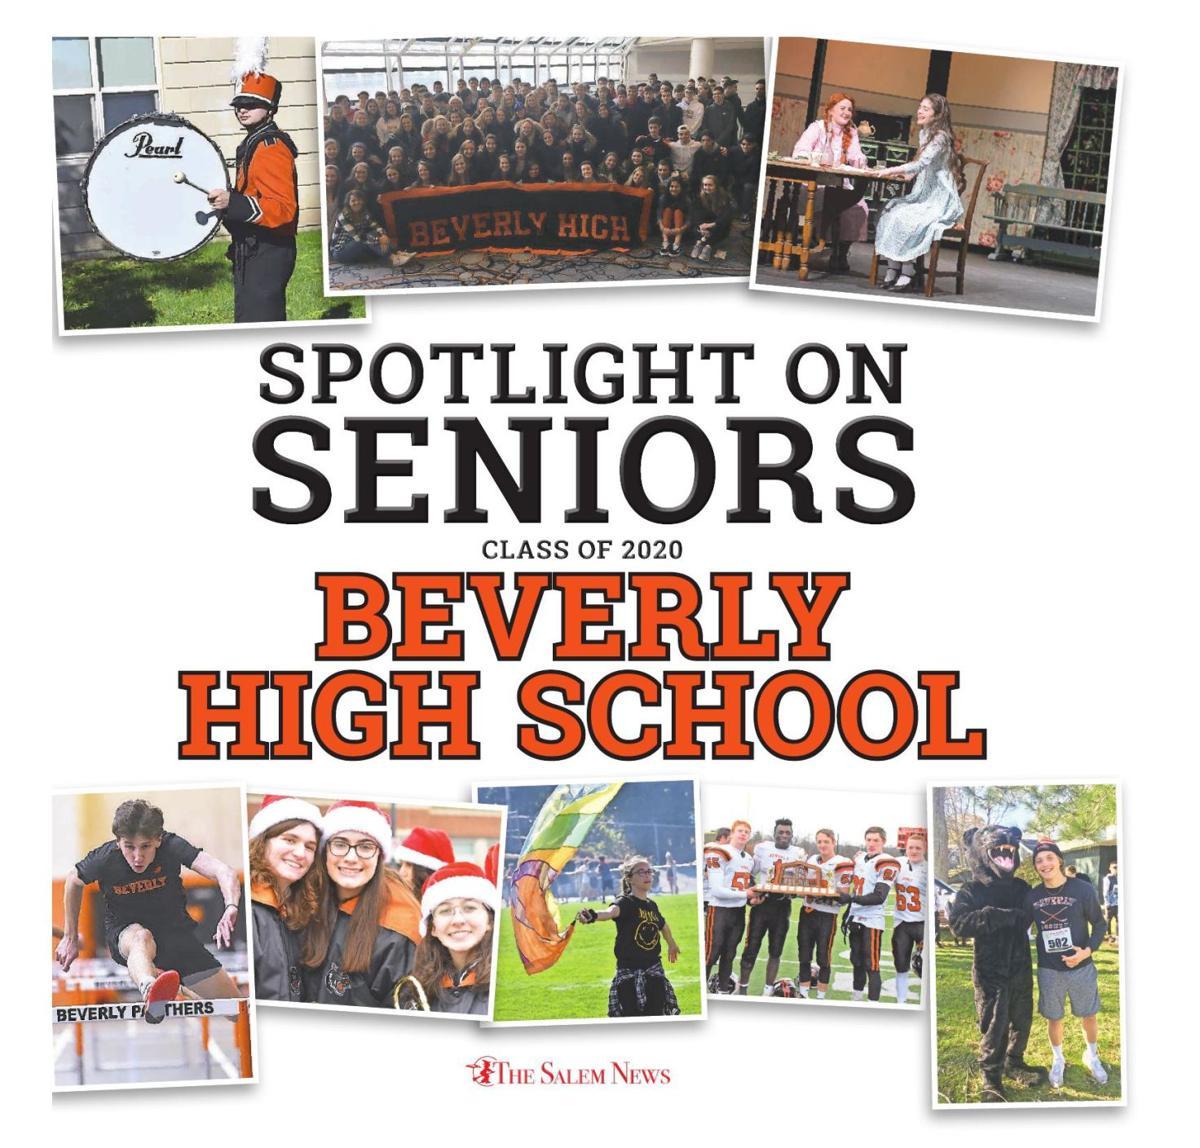 Spotlight on Seniors: Beverly High School